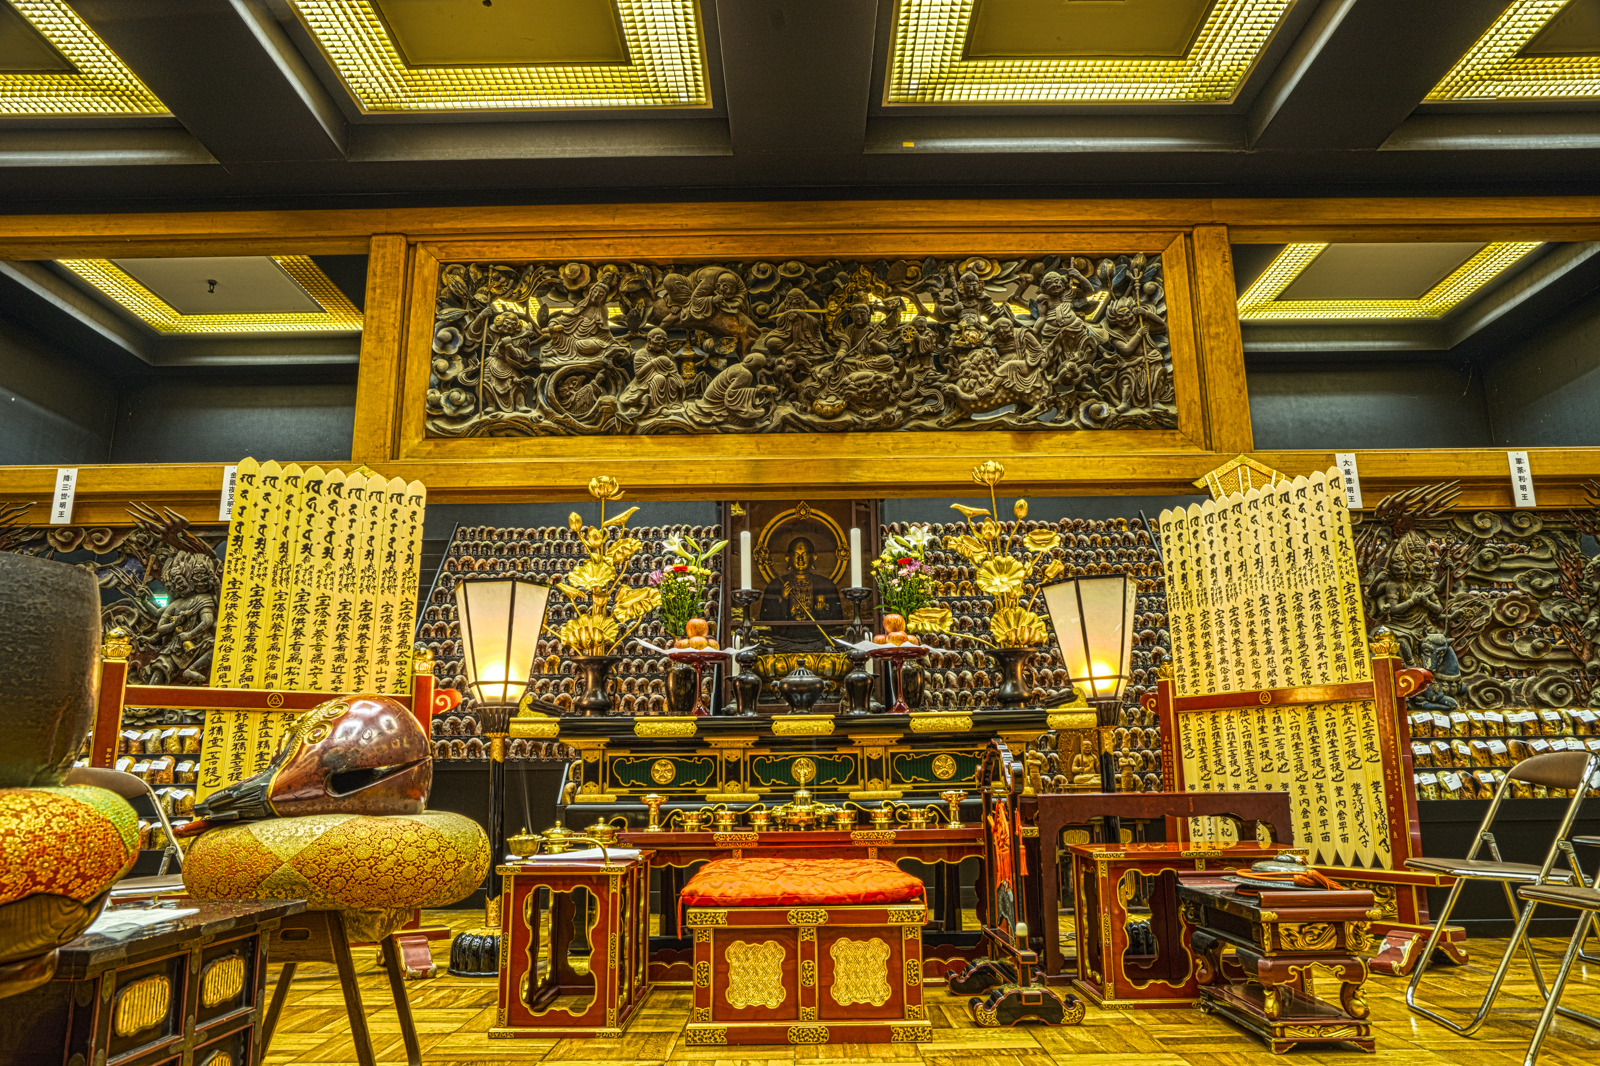 五部権現社殿、千体地蔵堂参拝口内のHDR写真